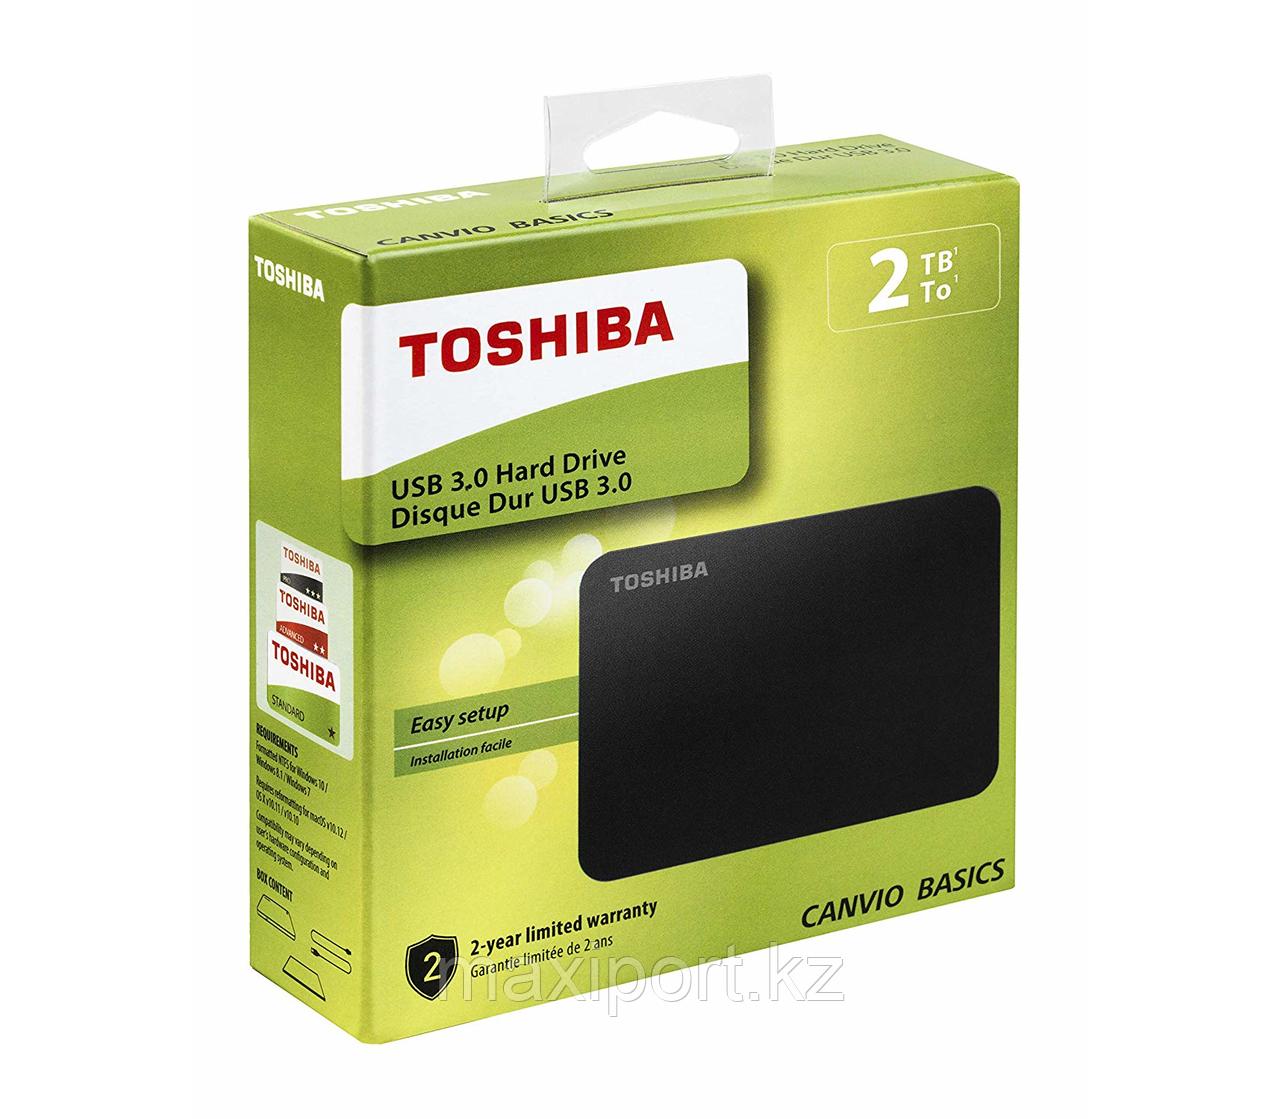 Toshiba canvio basics  2TB USB3.0 Hard Drive